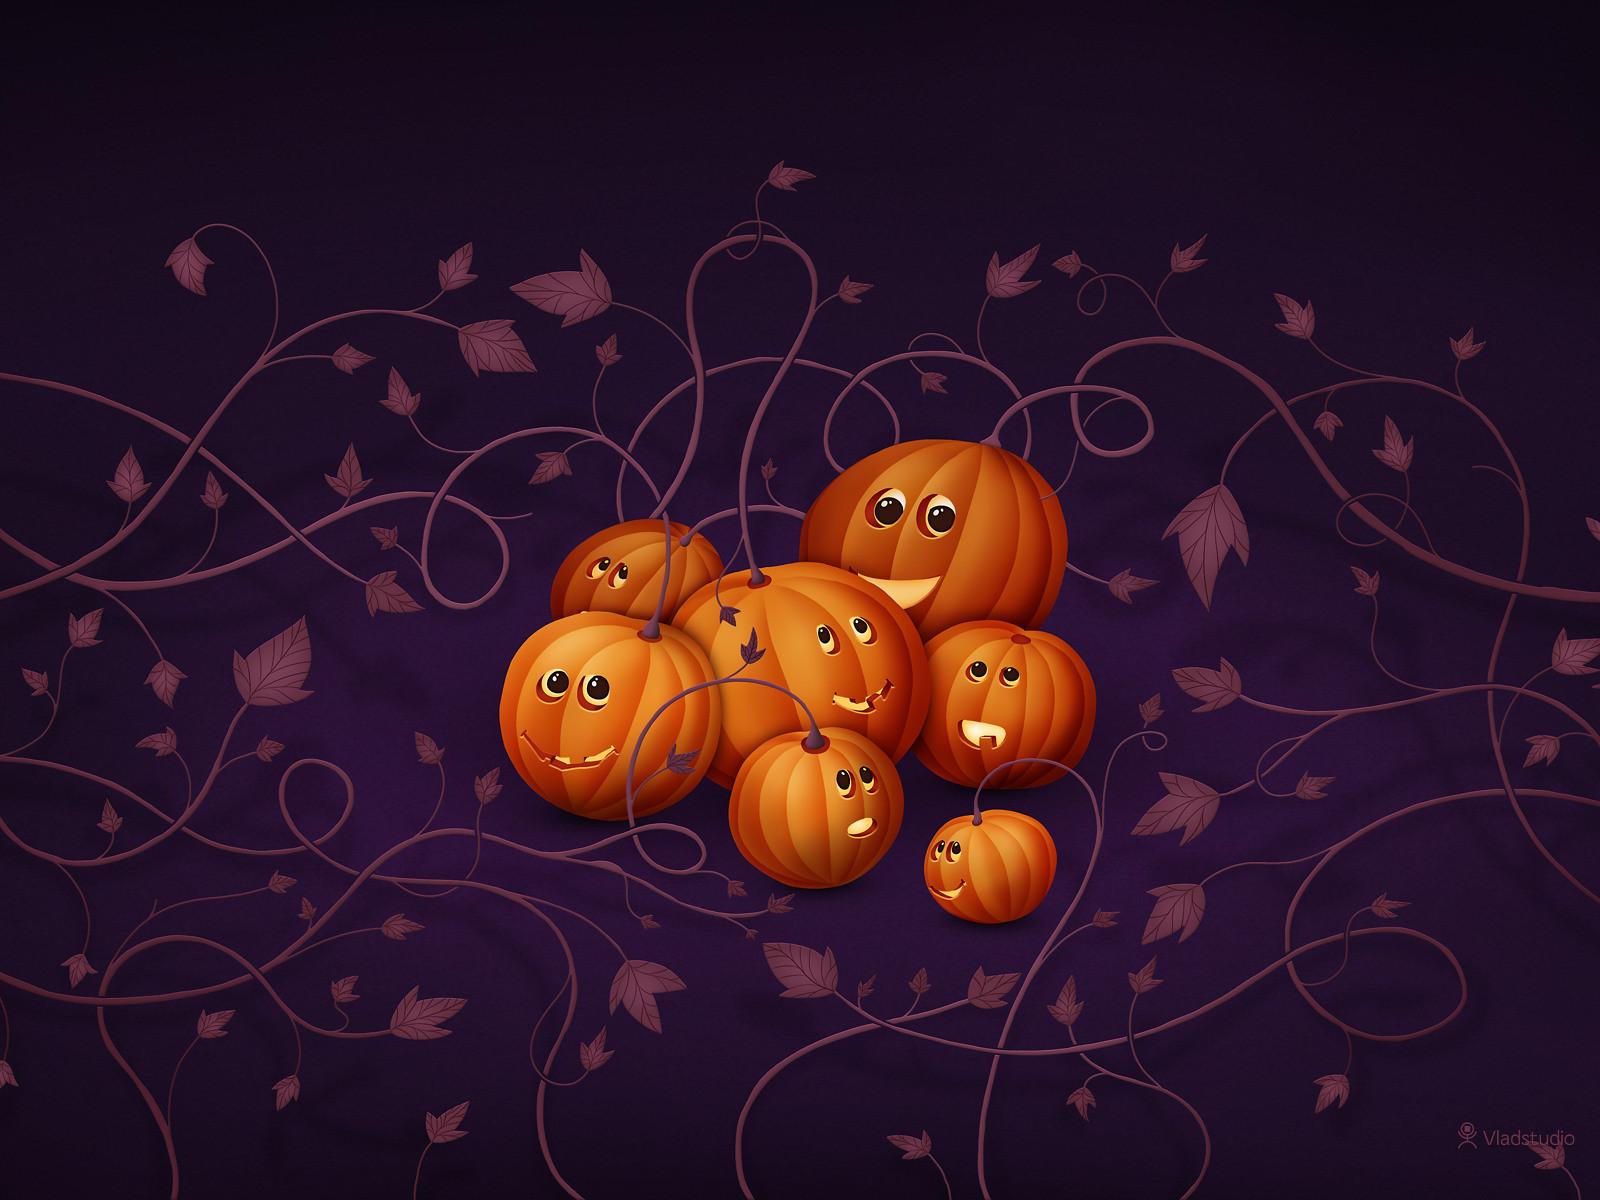 Halloween 3D Wallpaper  [50 ] Free Halloween 3D Desktop Wallpaper on WallpaperSafari